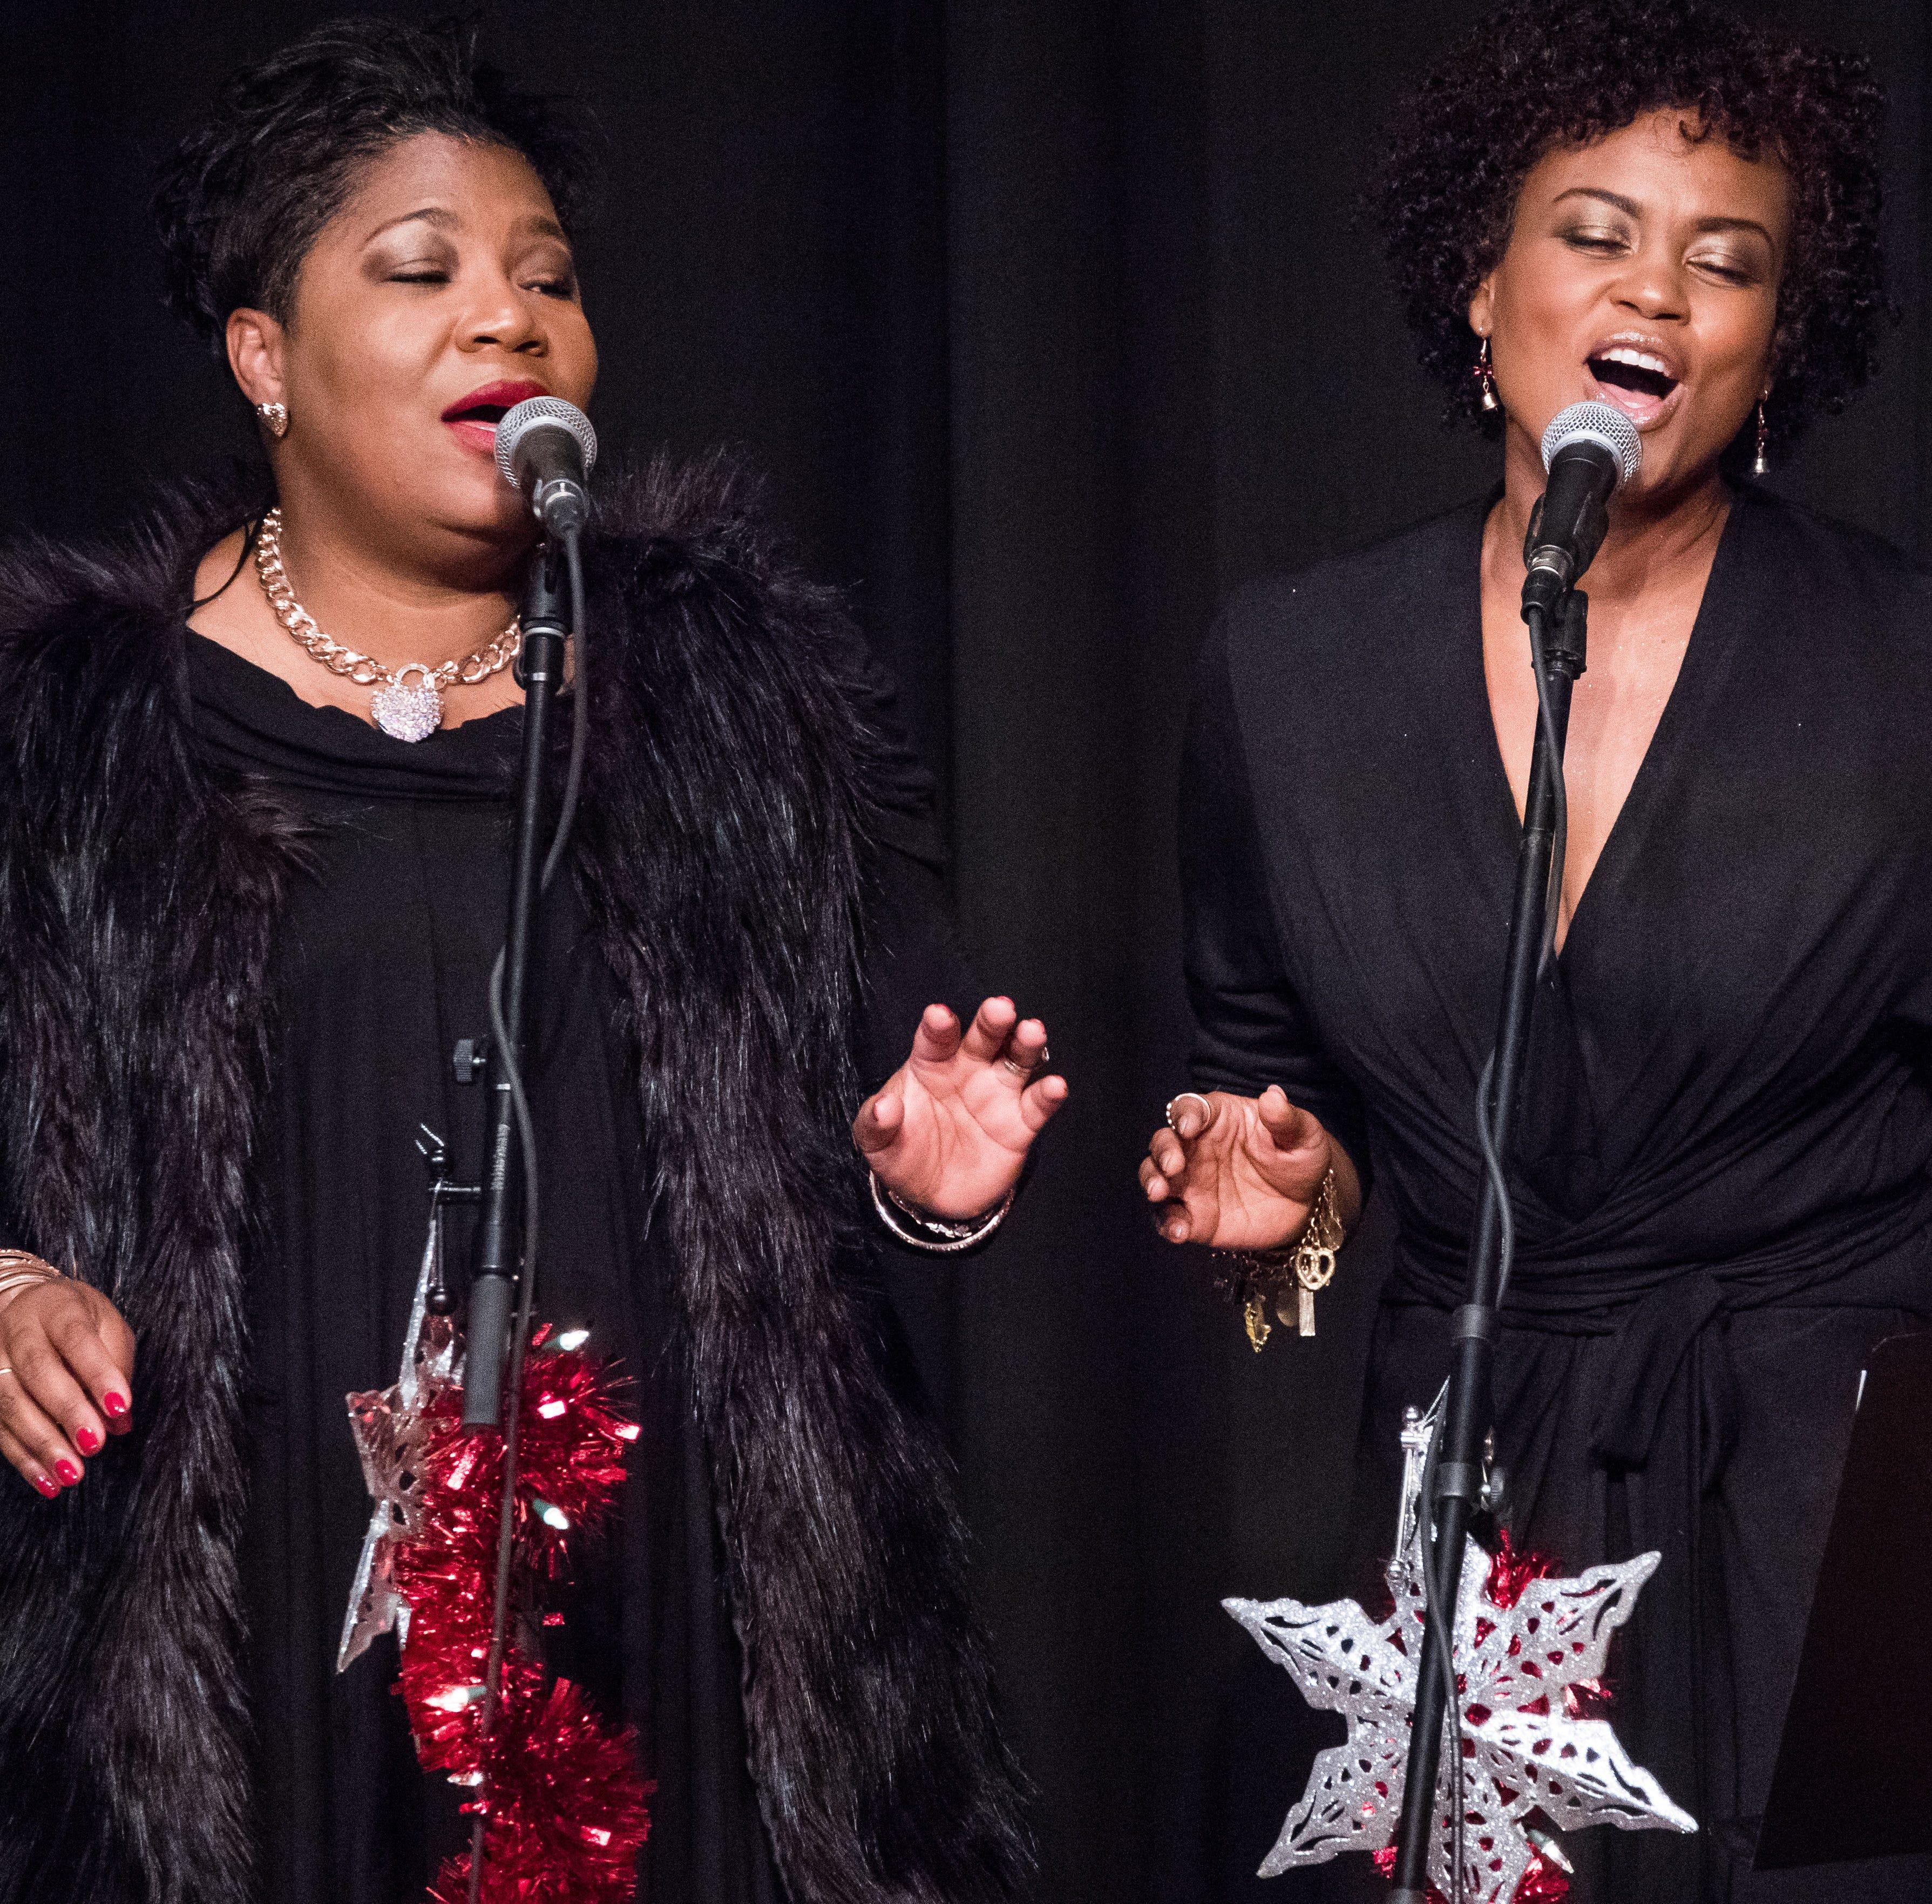 Local singers admire Aretha Franklin's gospel roots